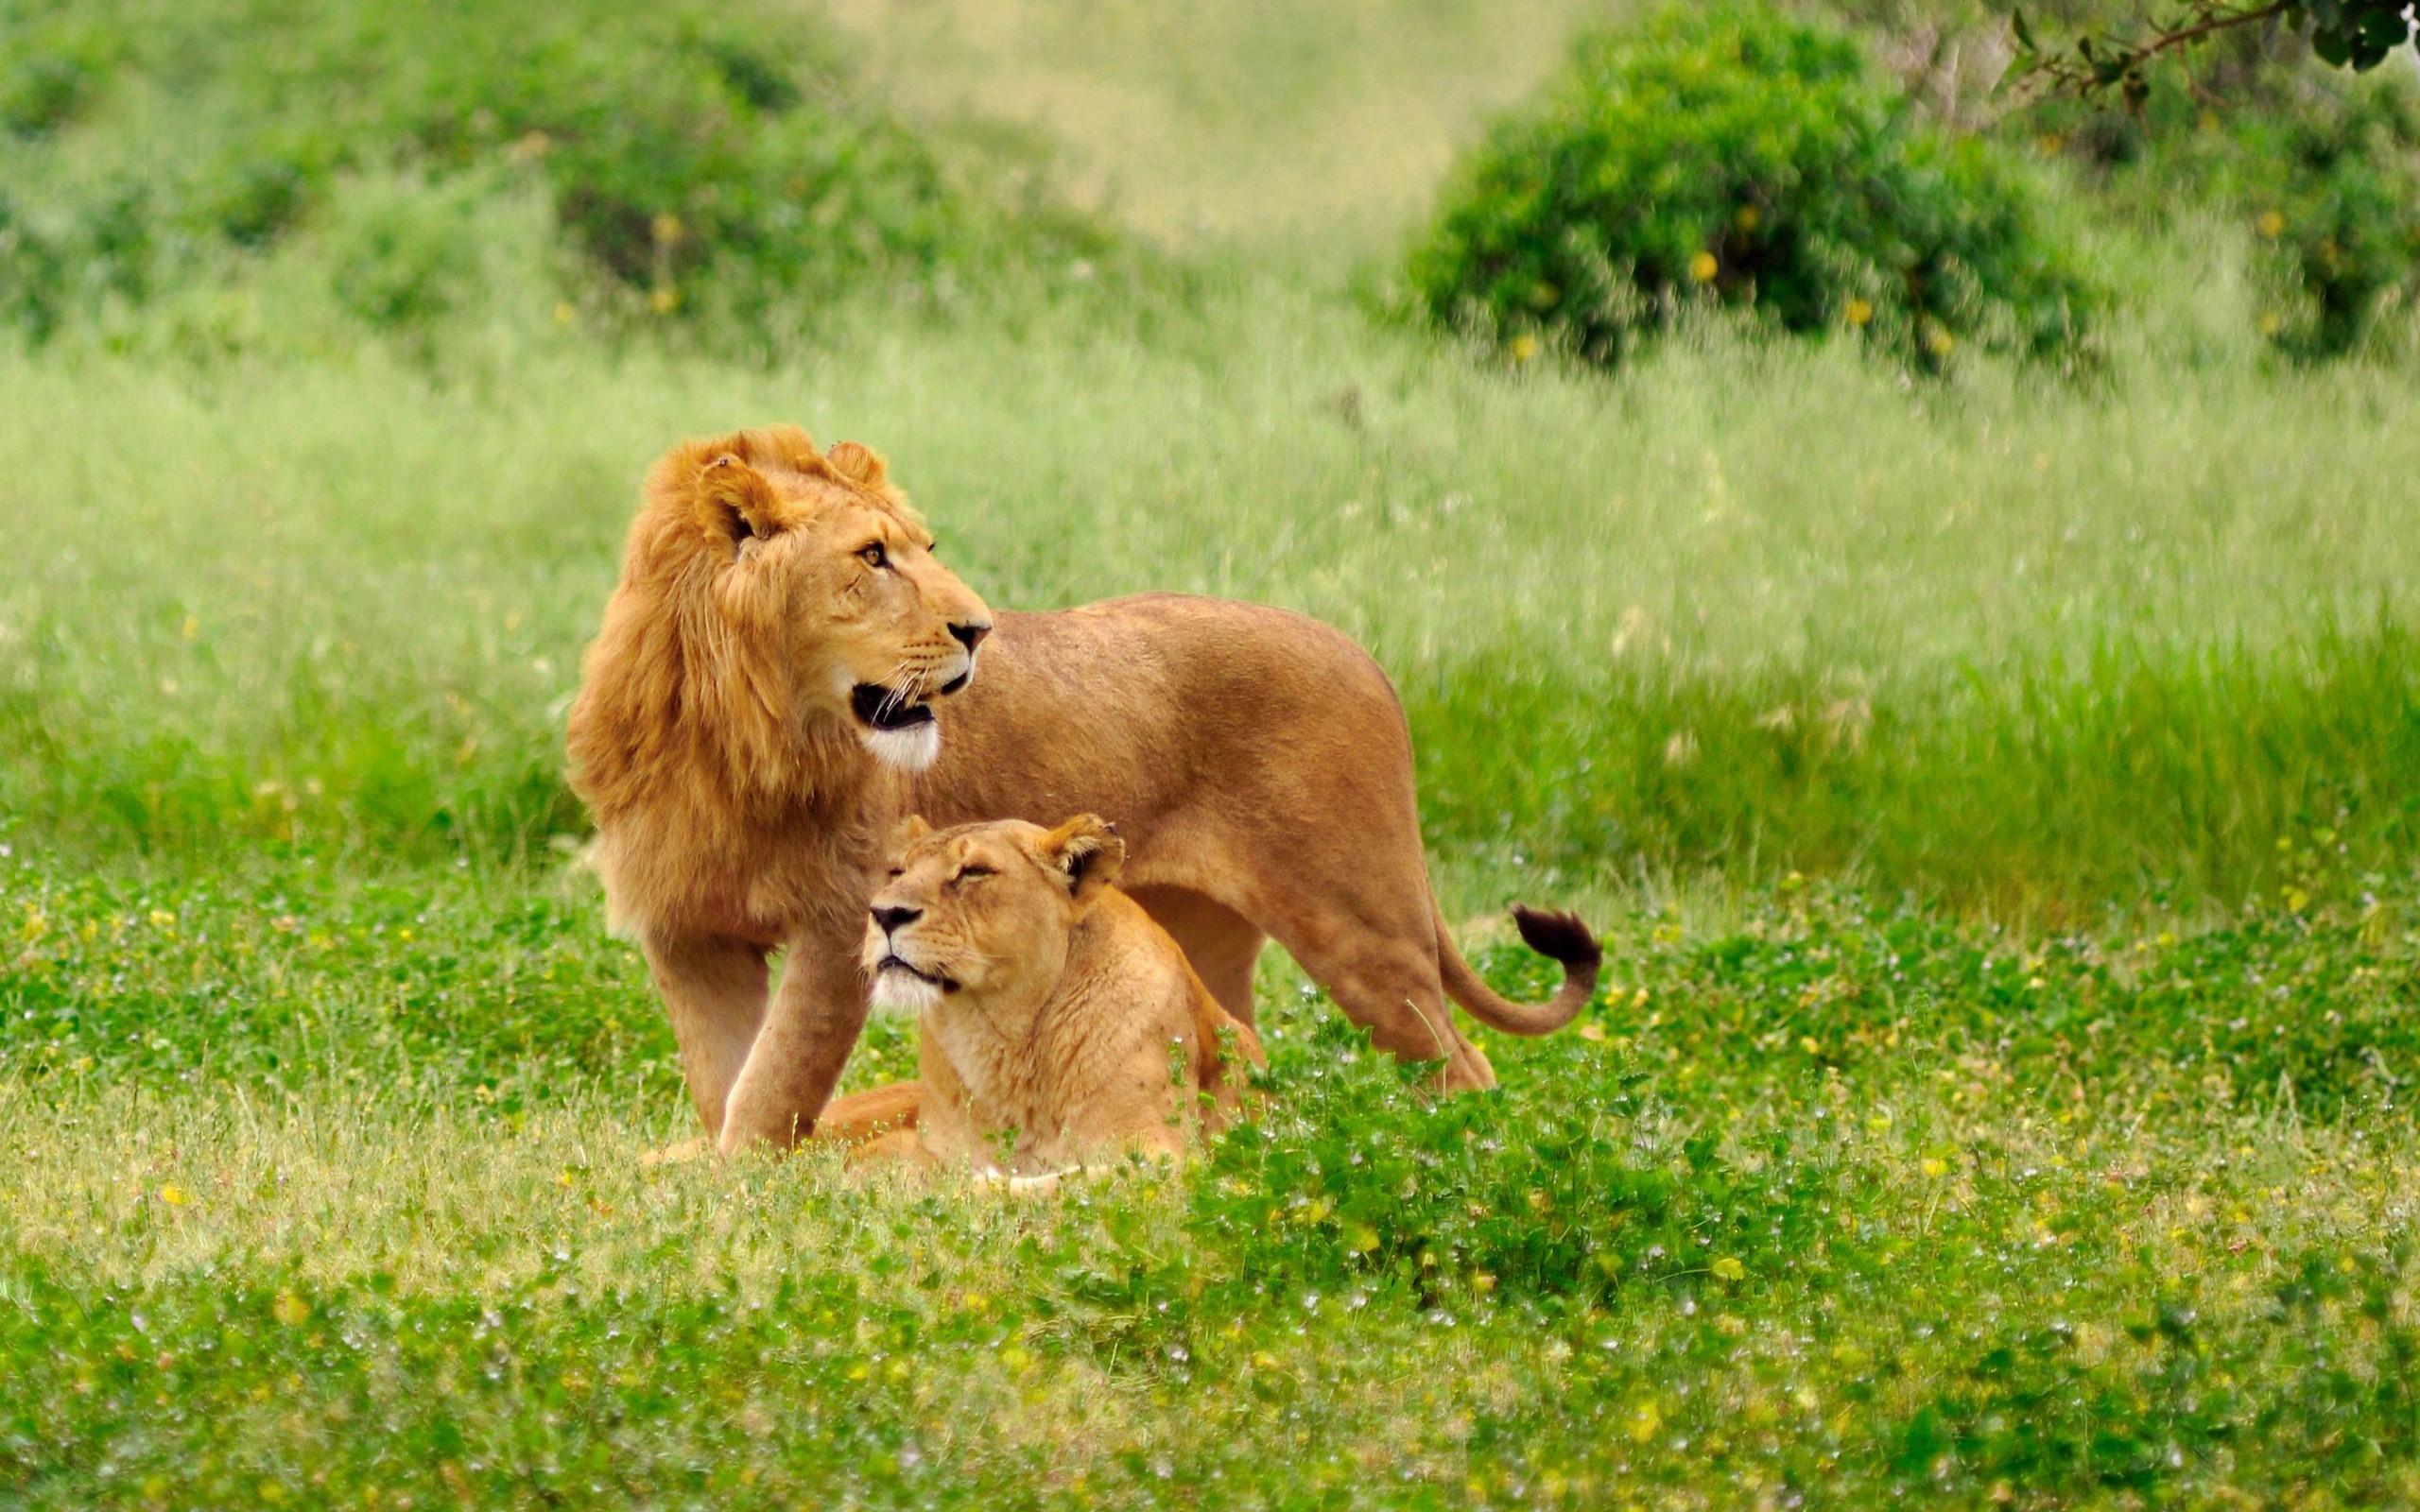 Lion family wallpaper - photo#47